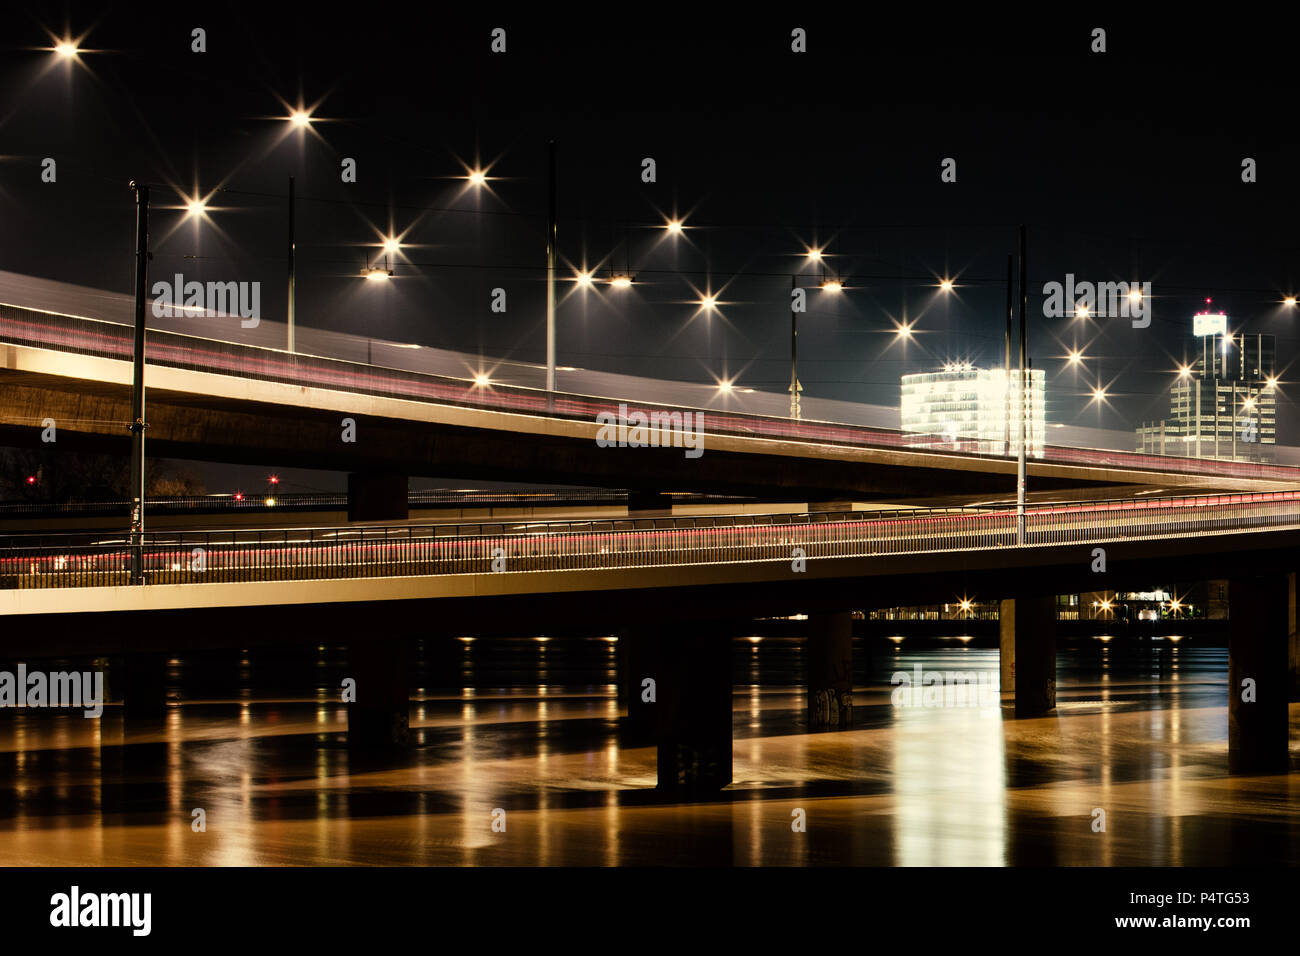 Bridge over troubled water, Rheinkniebrücke Düsseldorf - Stock Image